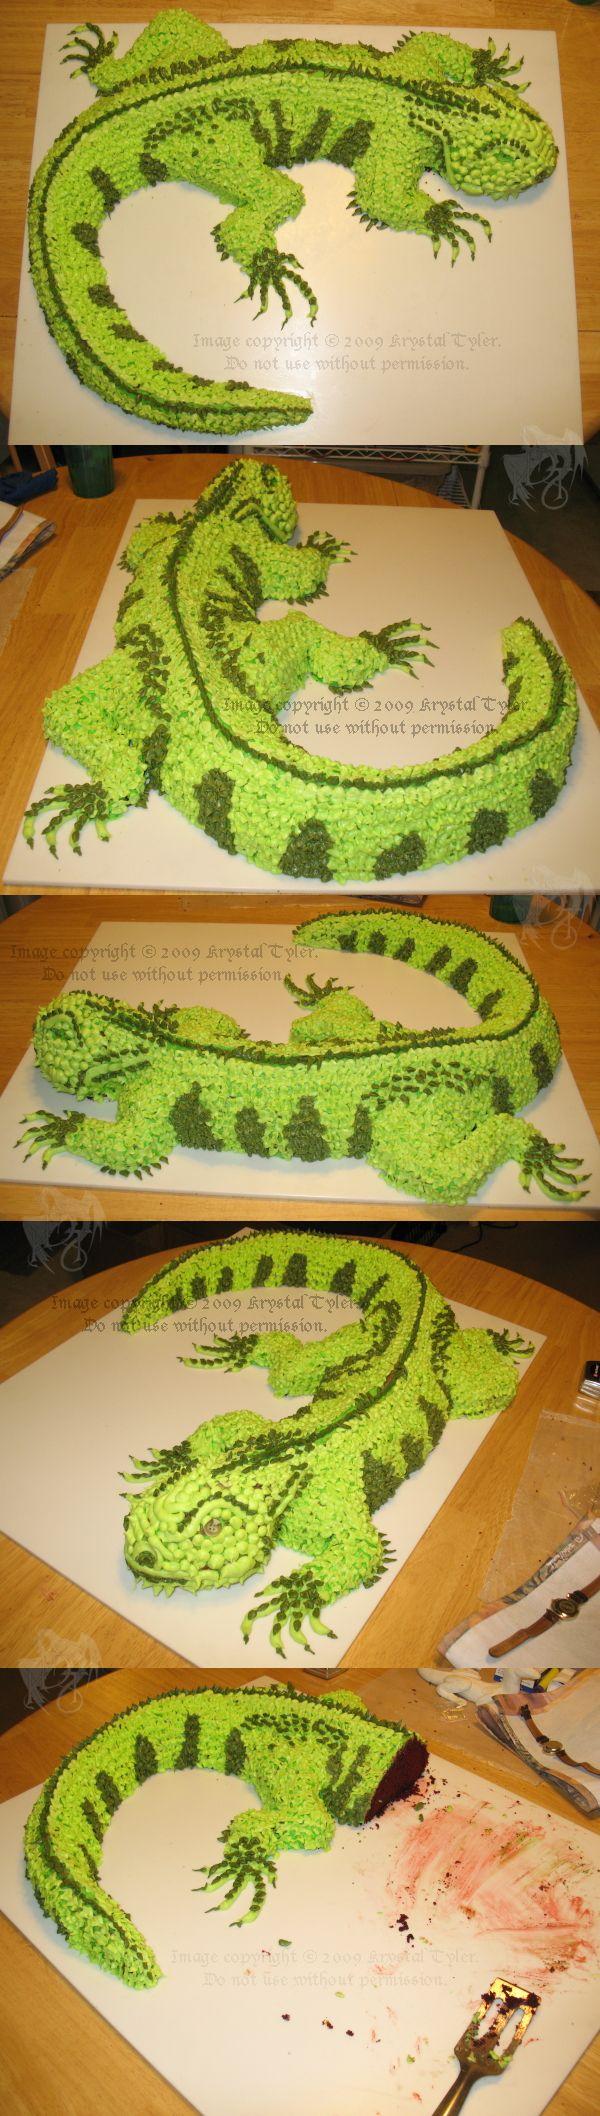 The Incredible, Edible Iguana by R-Eventide.deviantart.com on @deviantART